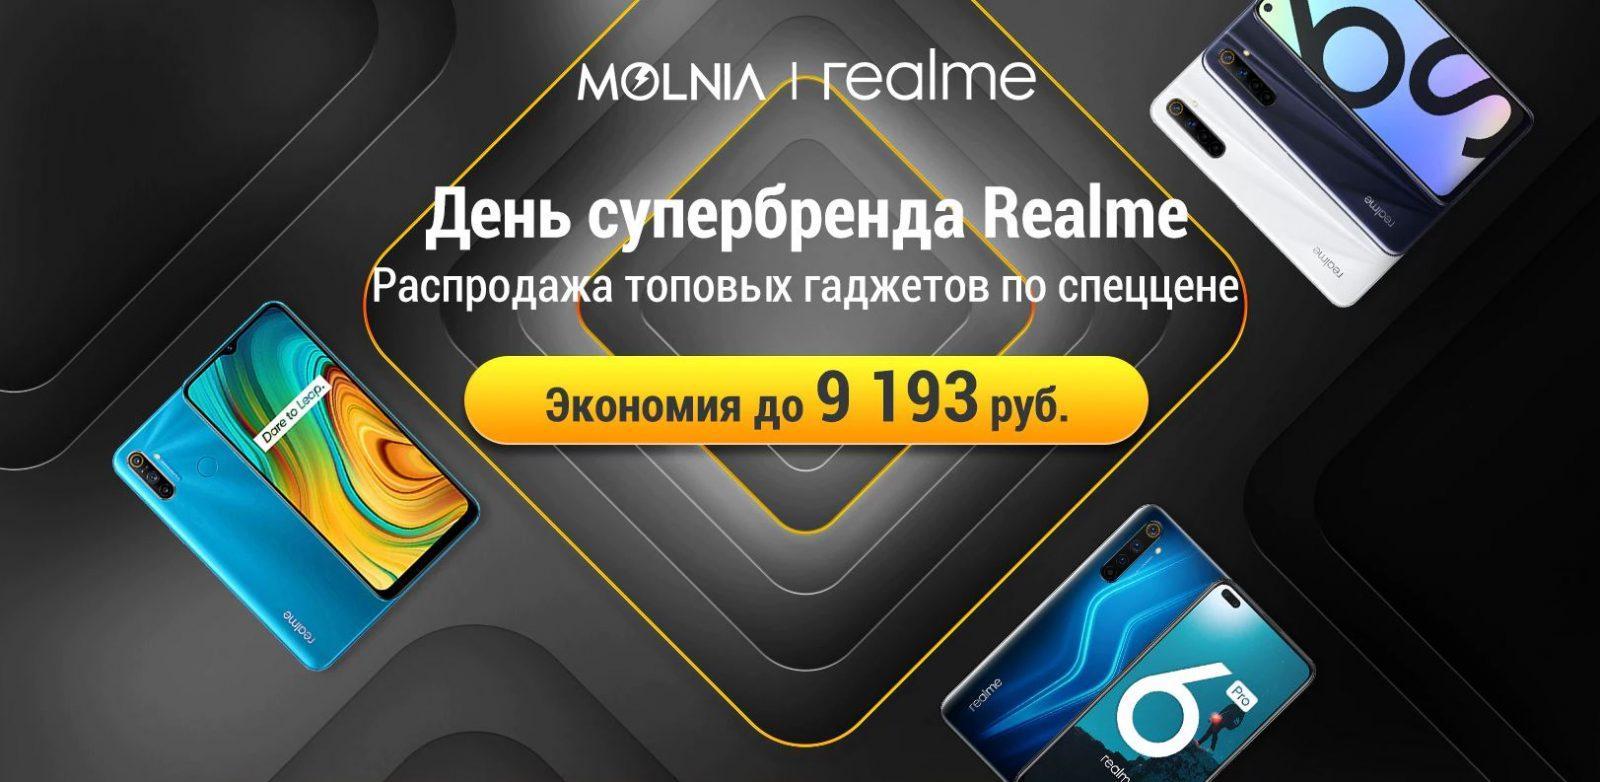 «День супербренда Realme» на AliExpress Tmall